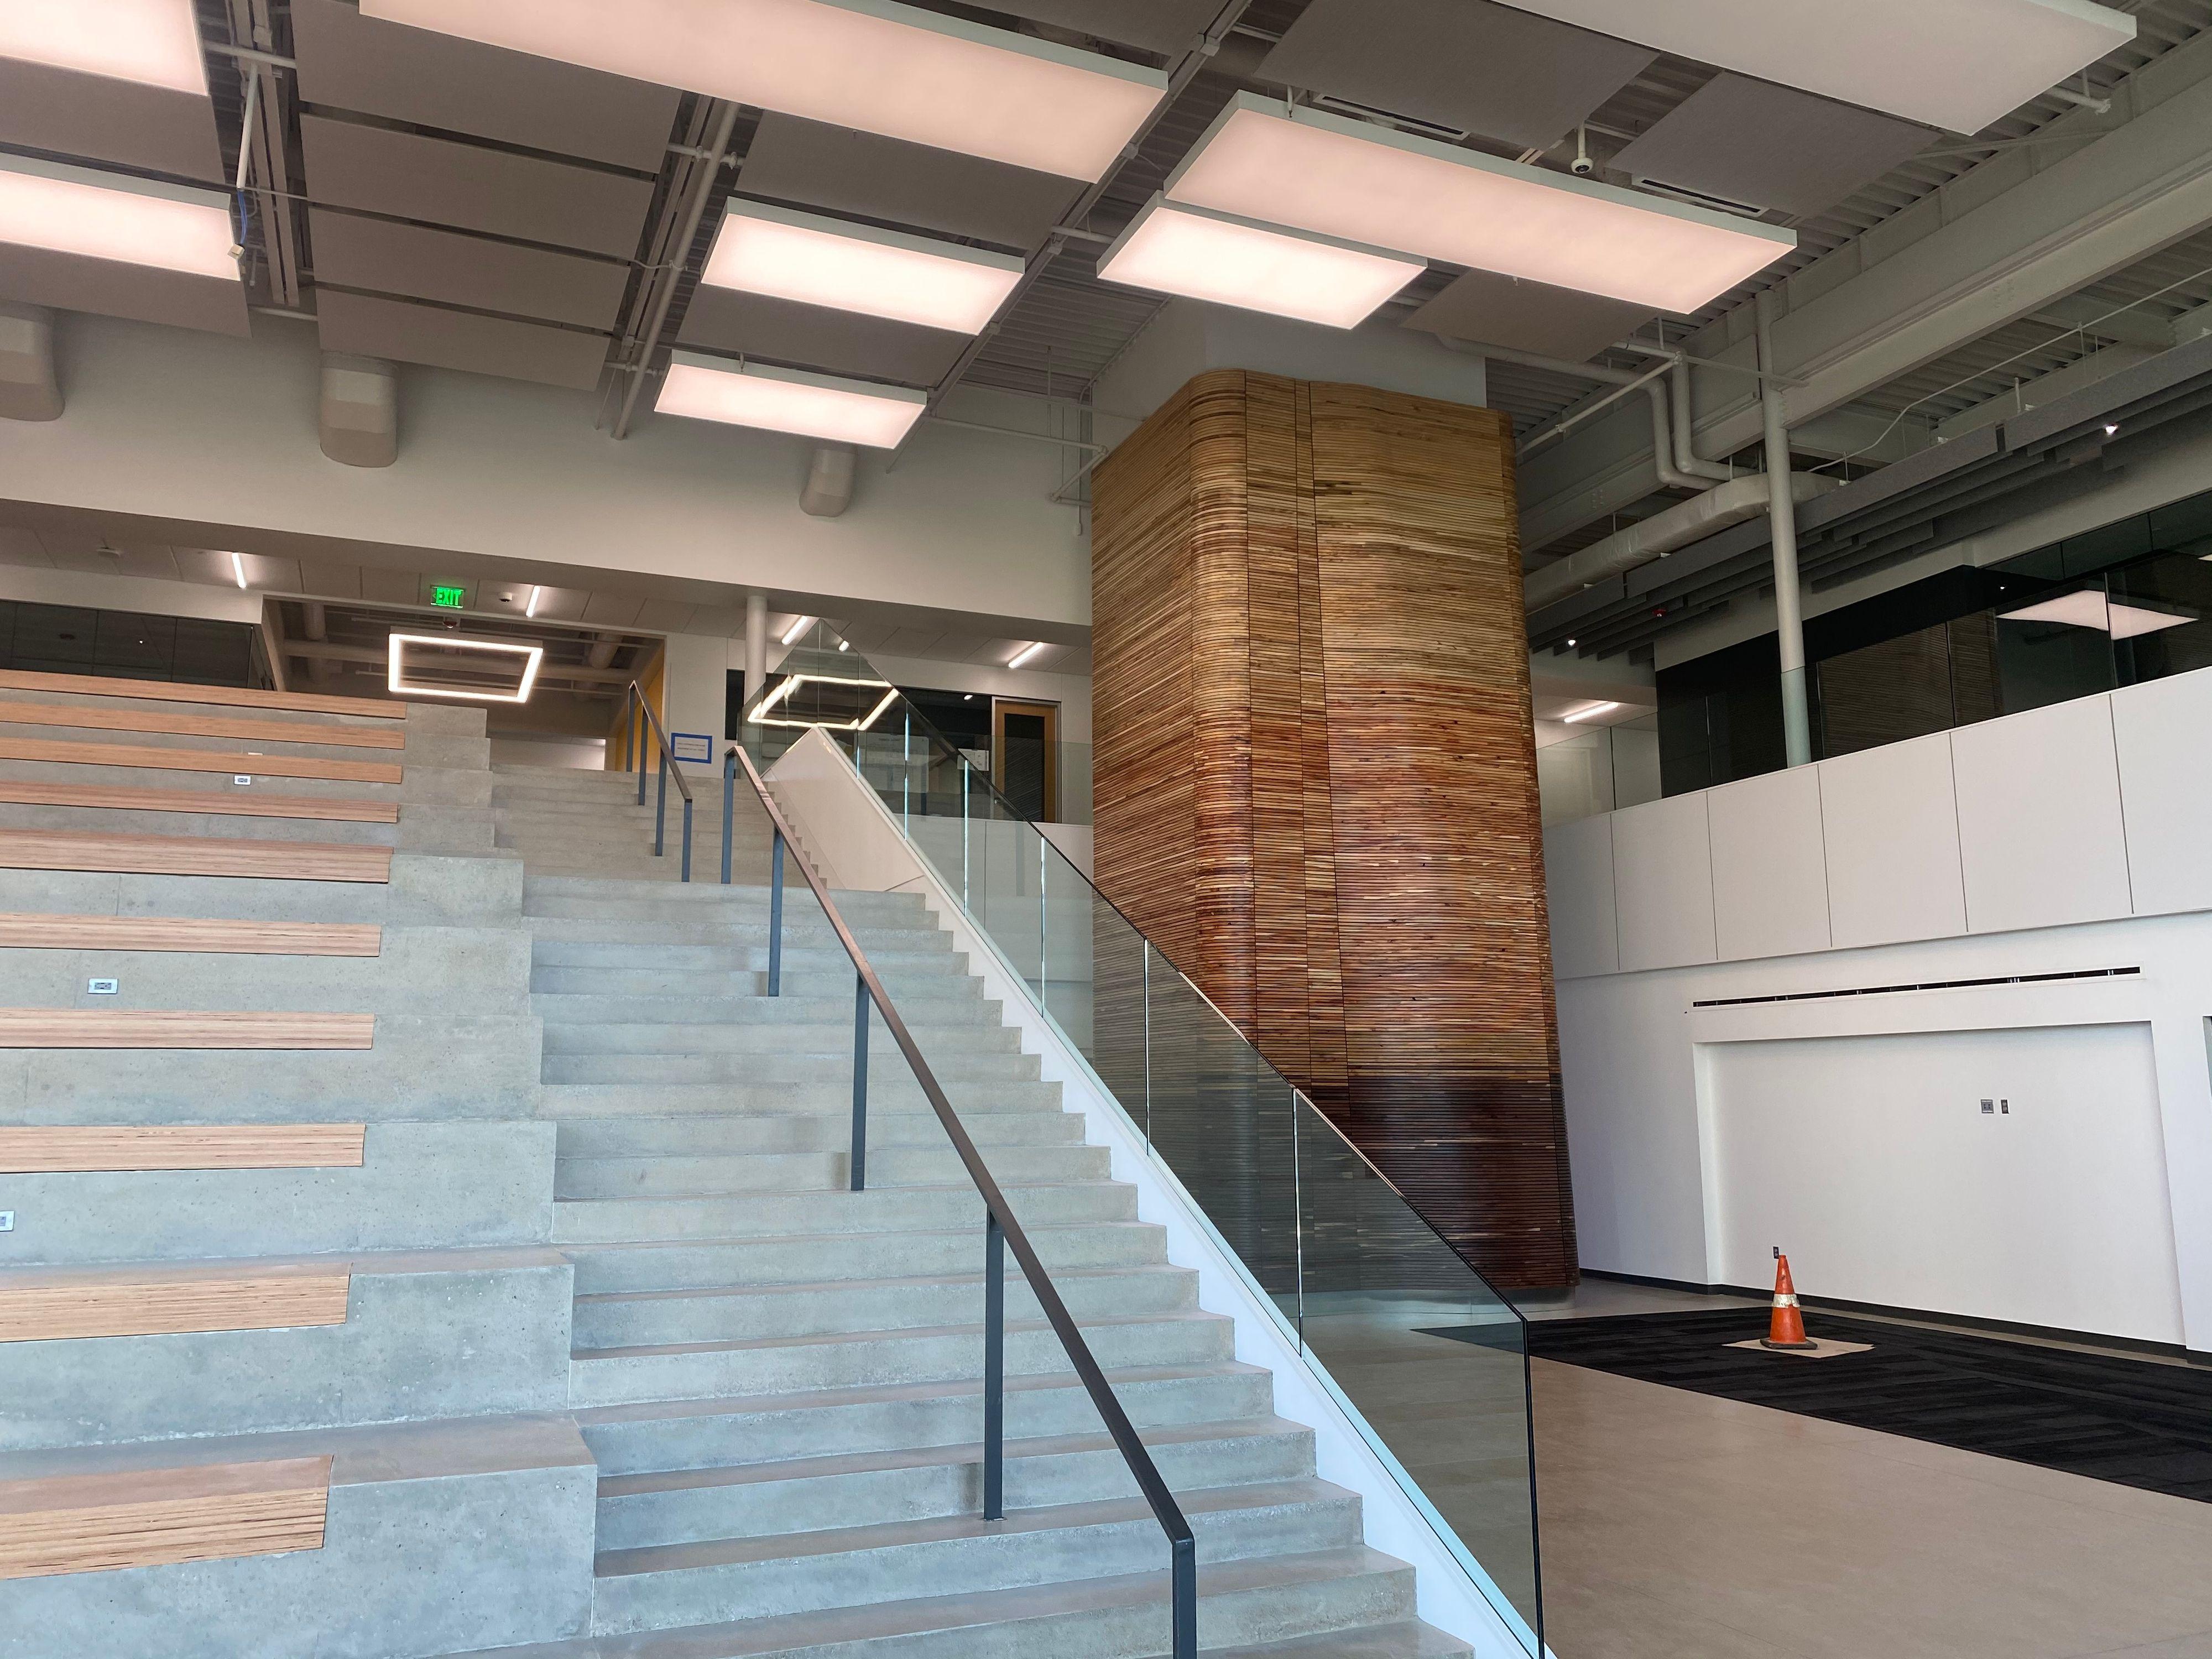 The Austin E. Knowlton Center at Baldwin Wallace University